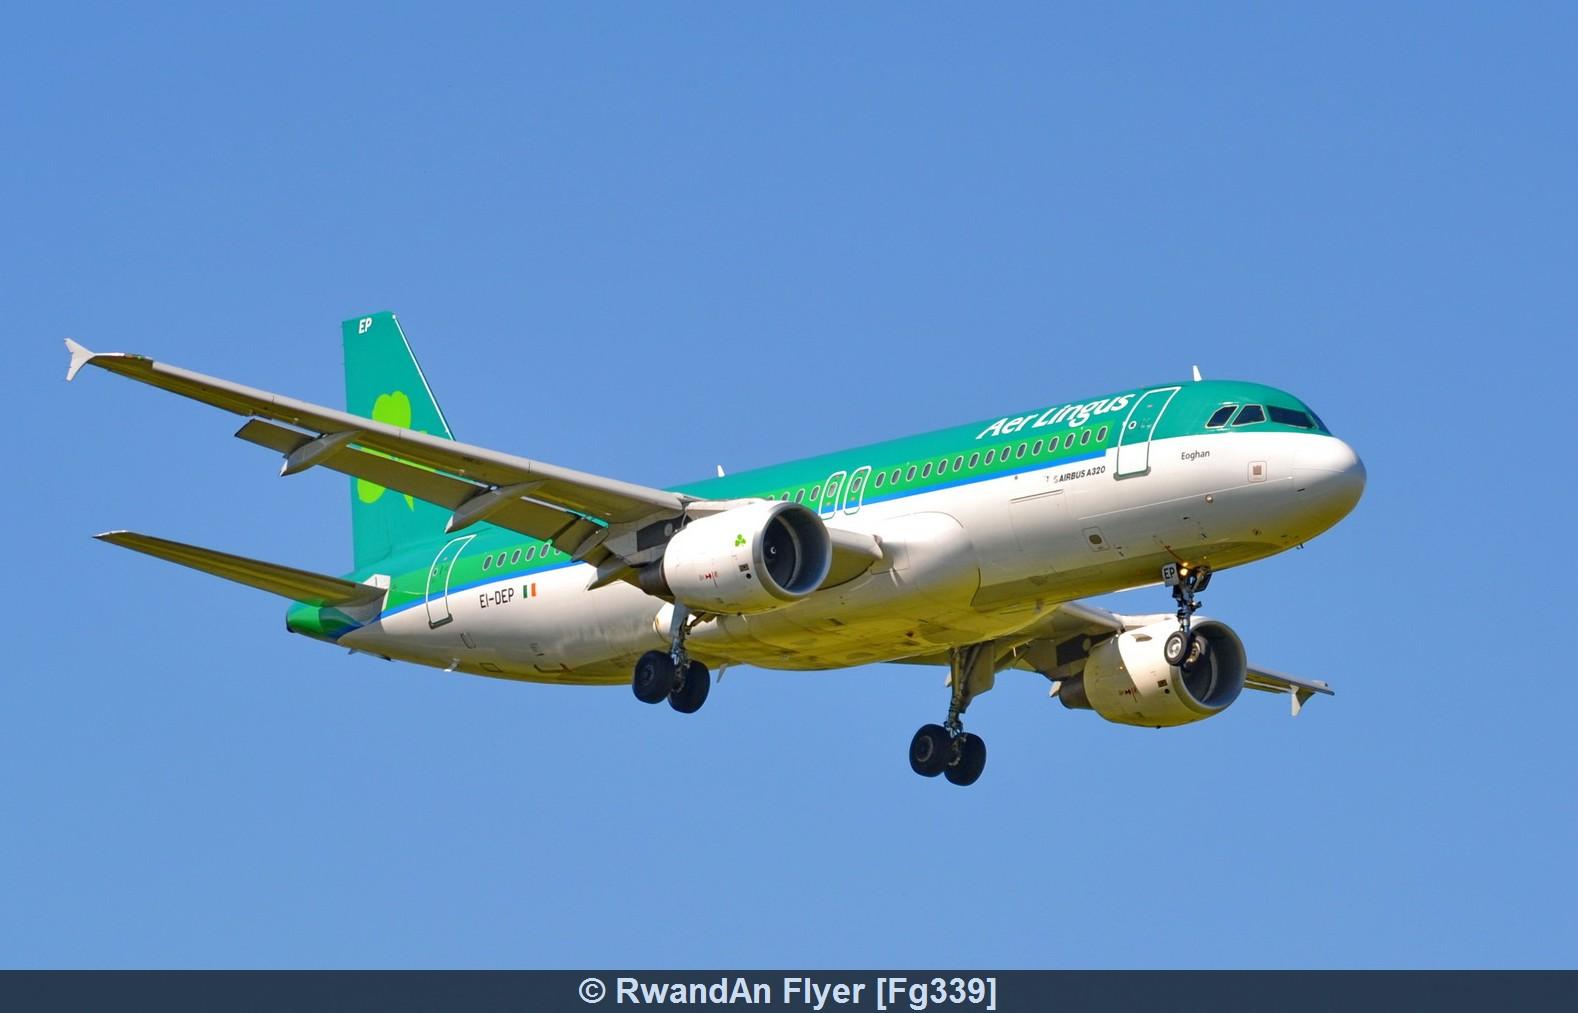 A-320 Aer Lingus 1.JPG